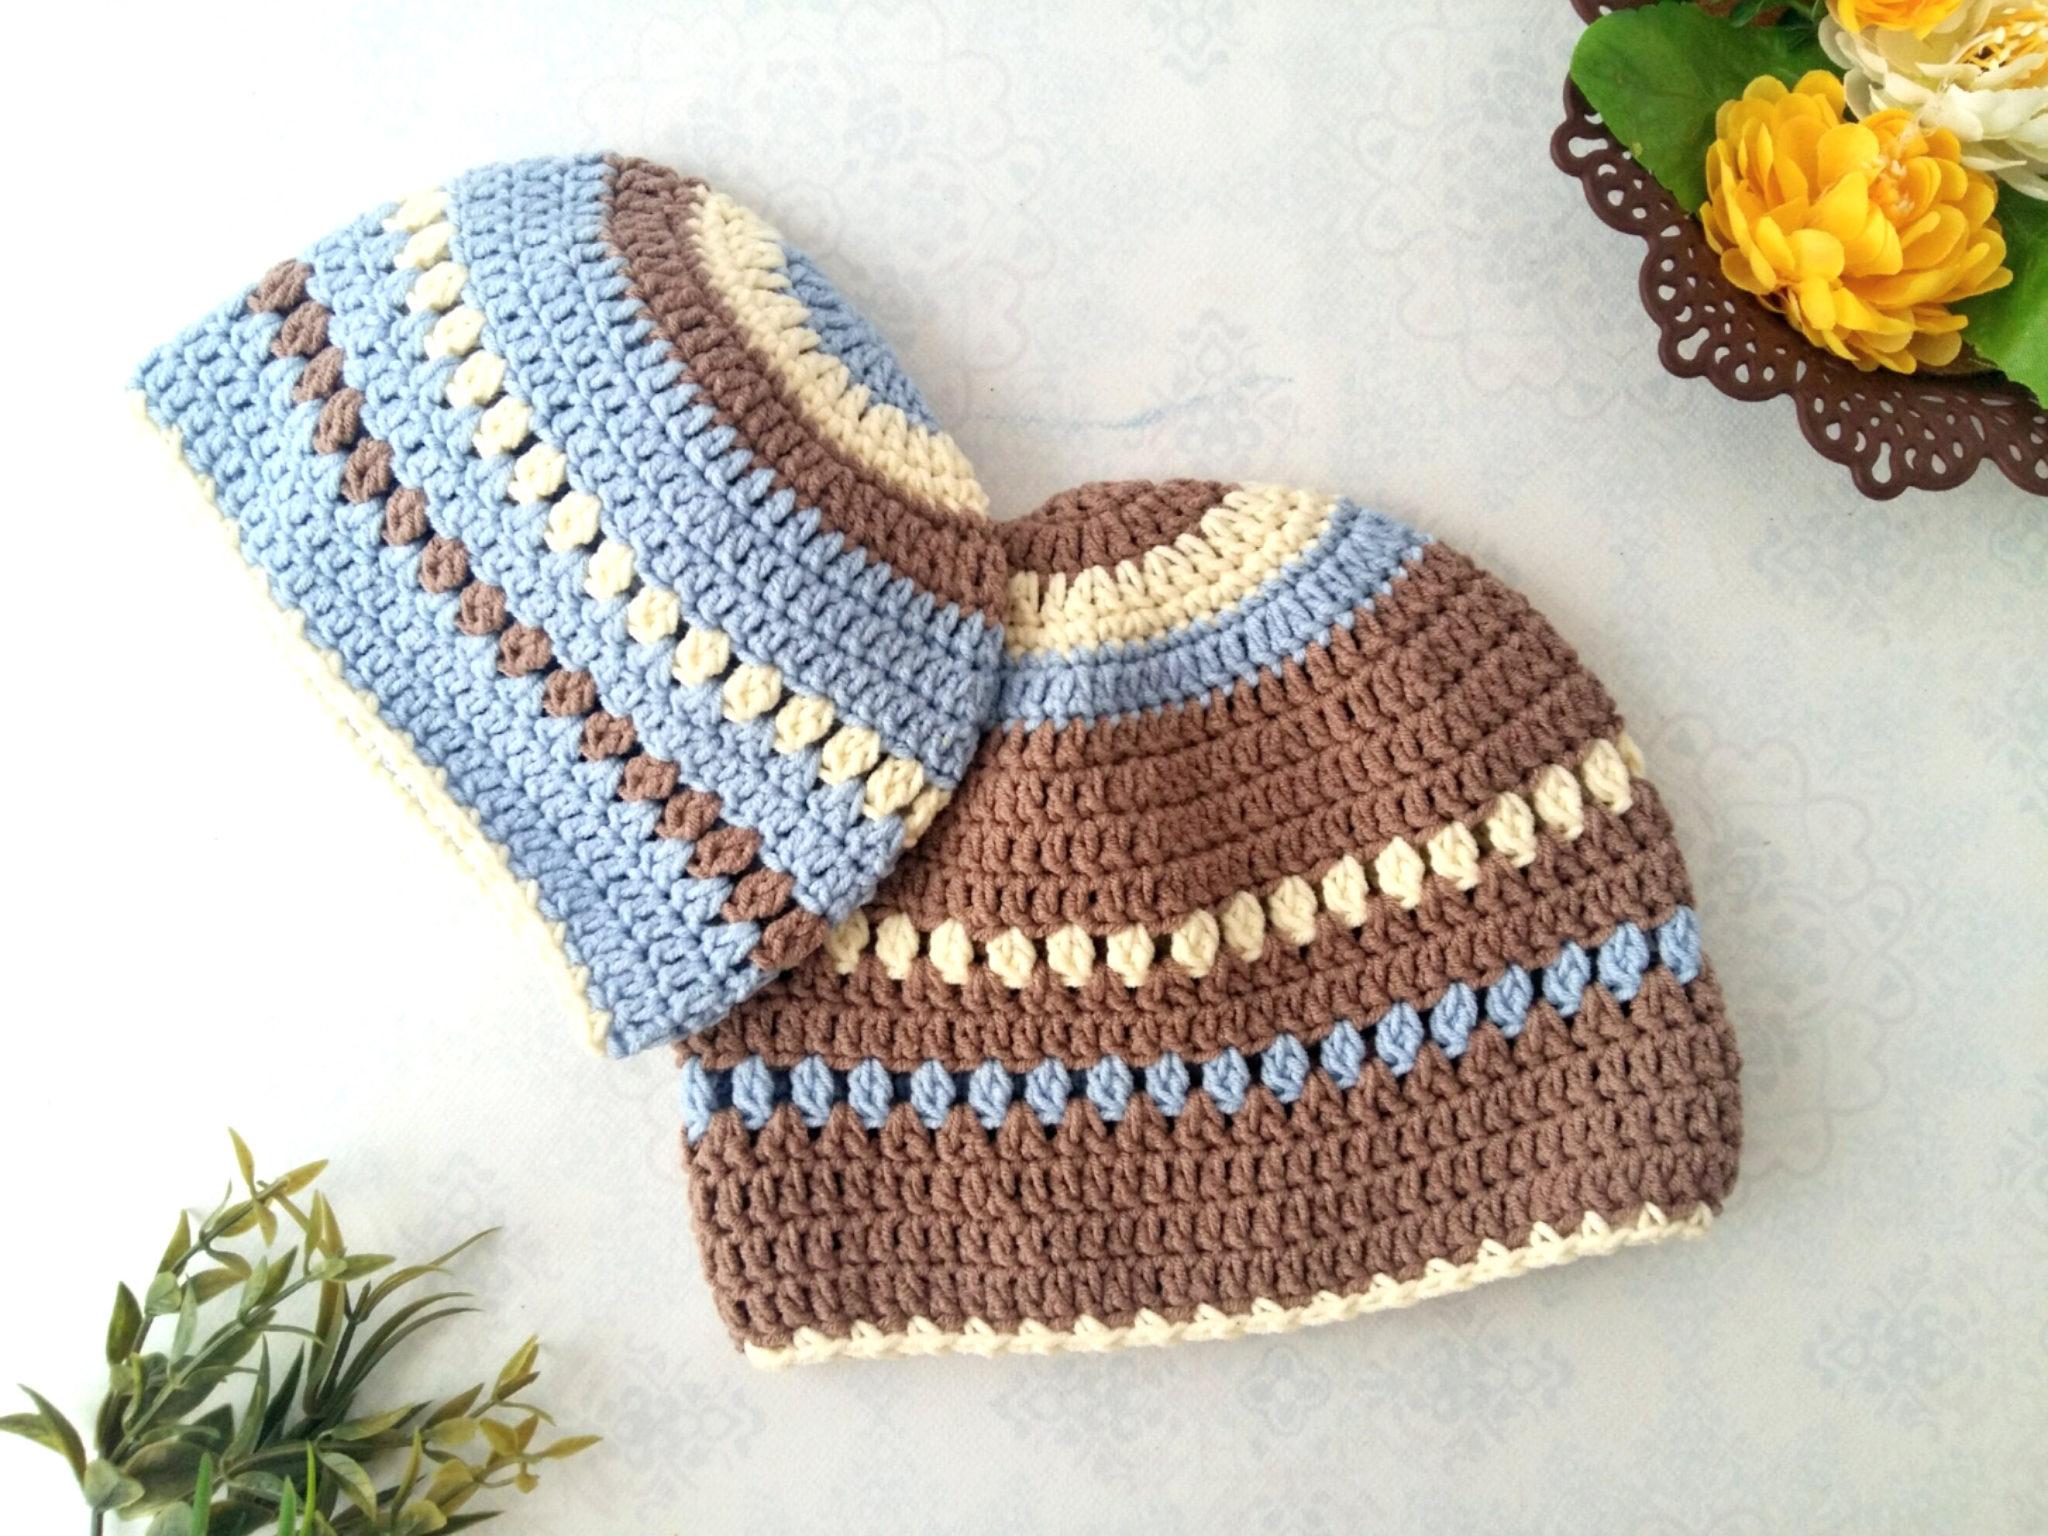 The creamy crochet baby beanie close up #crochet #baby #beanie